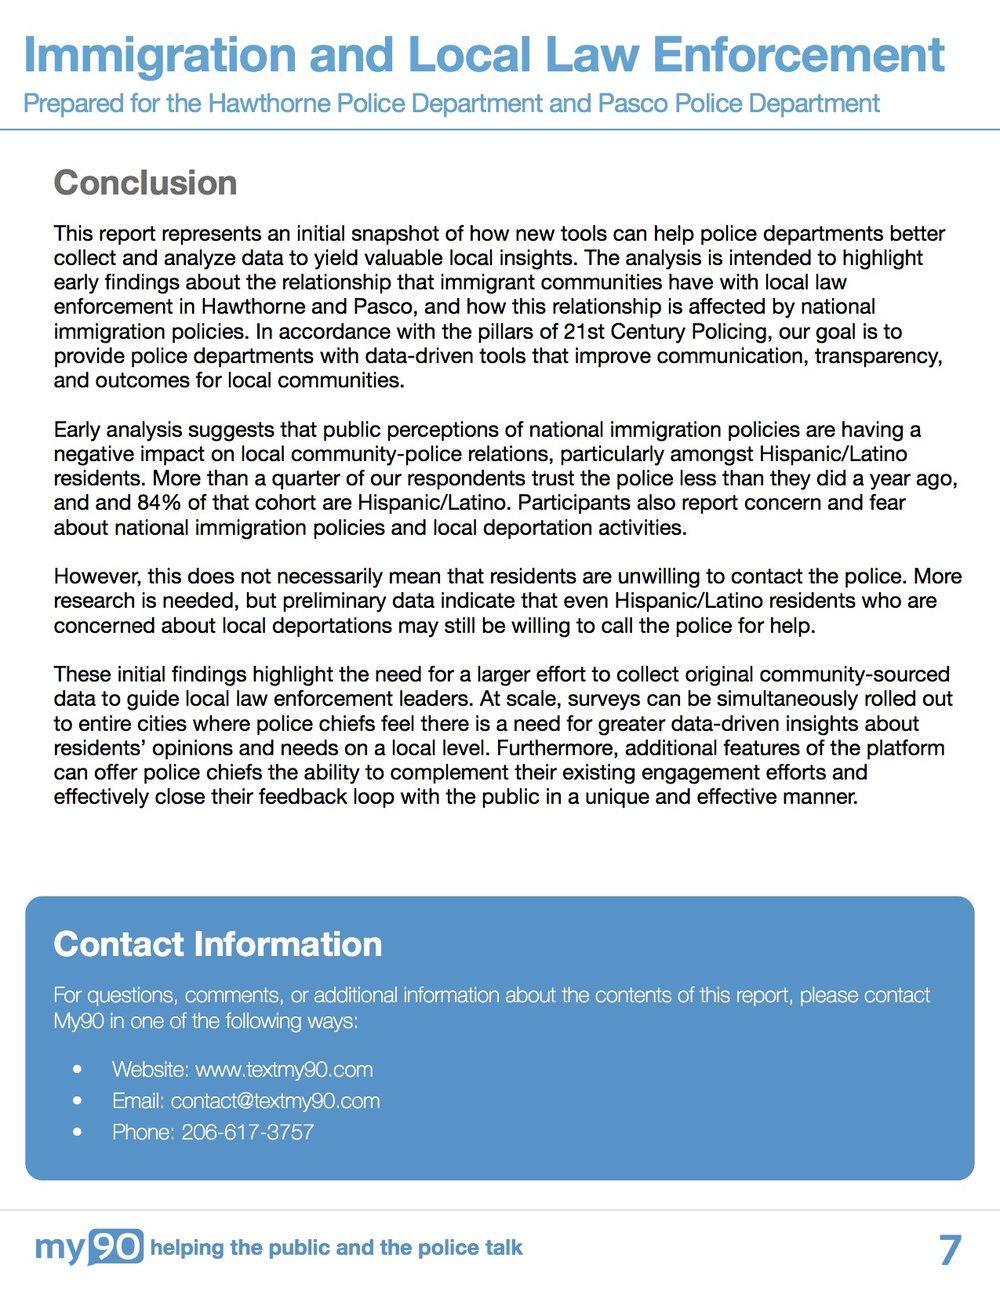 Immigration Report 7.jpg